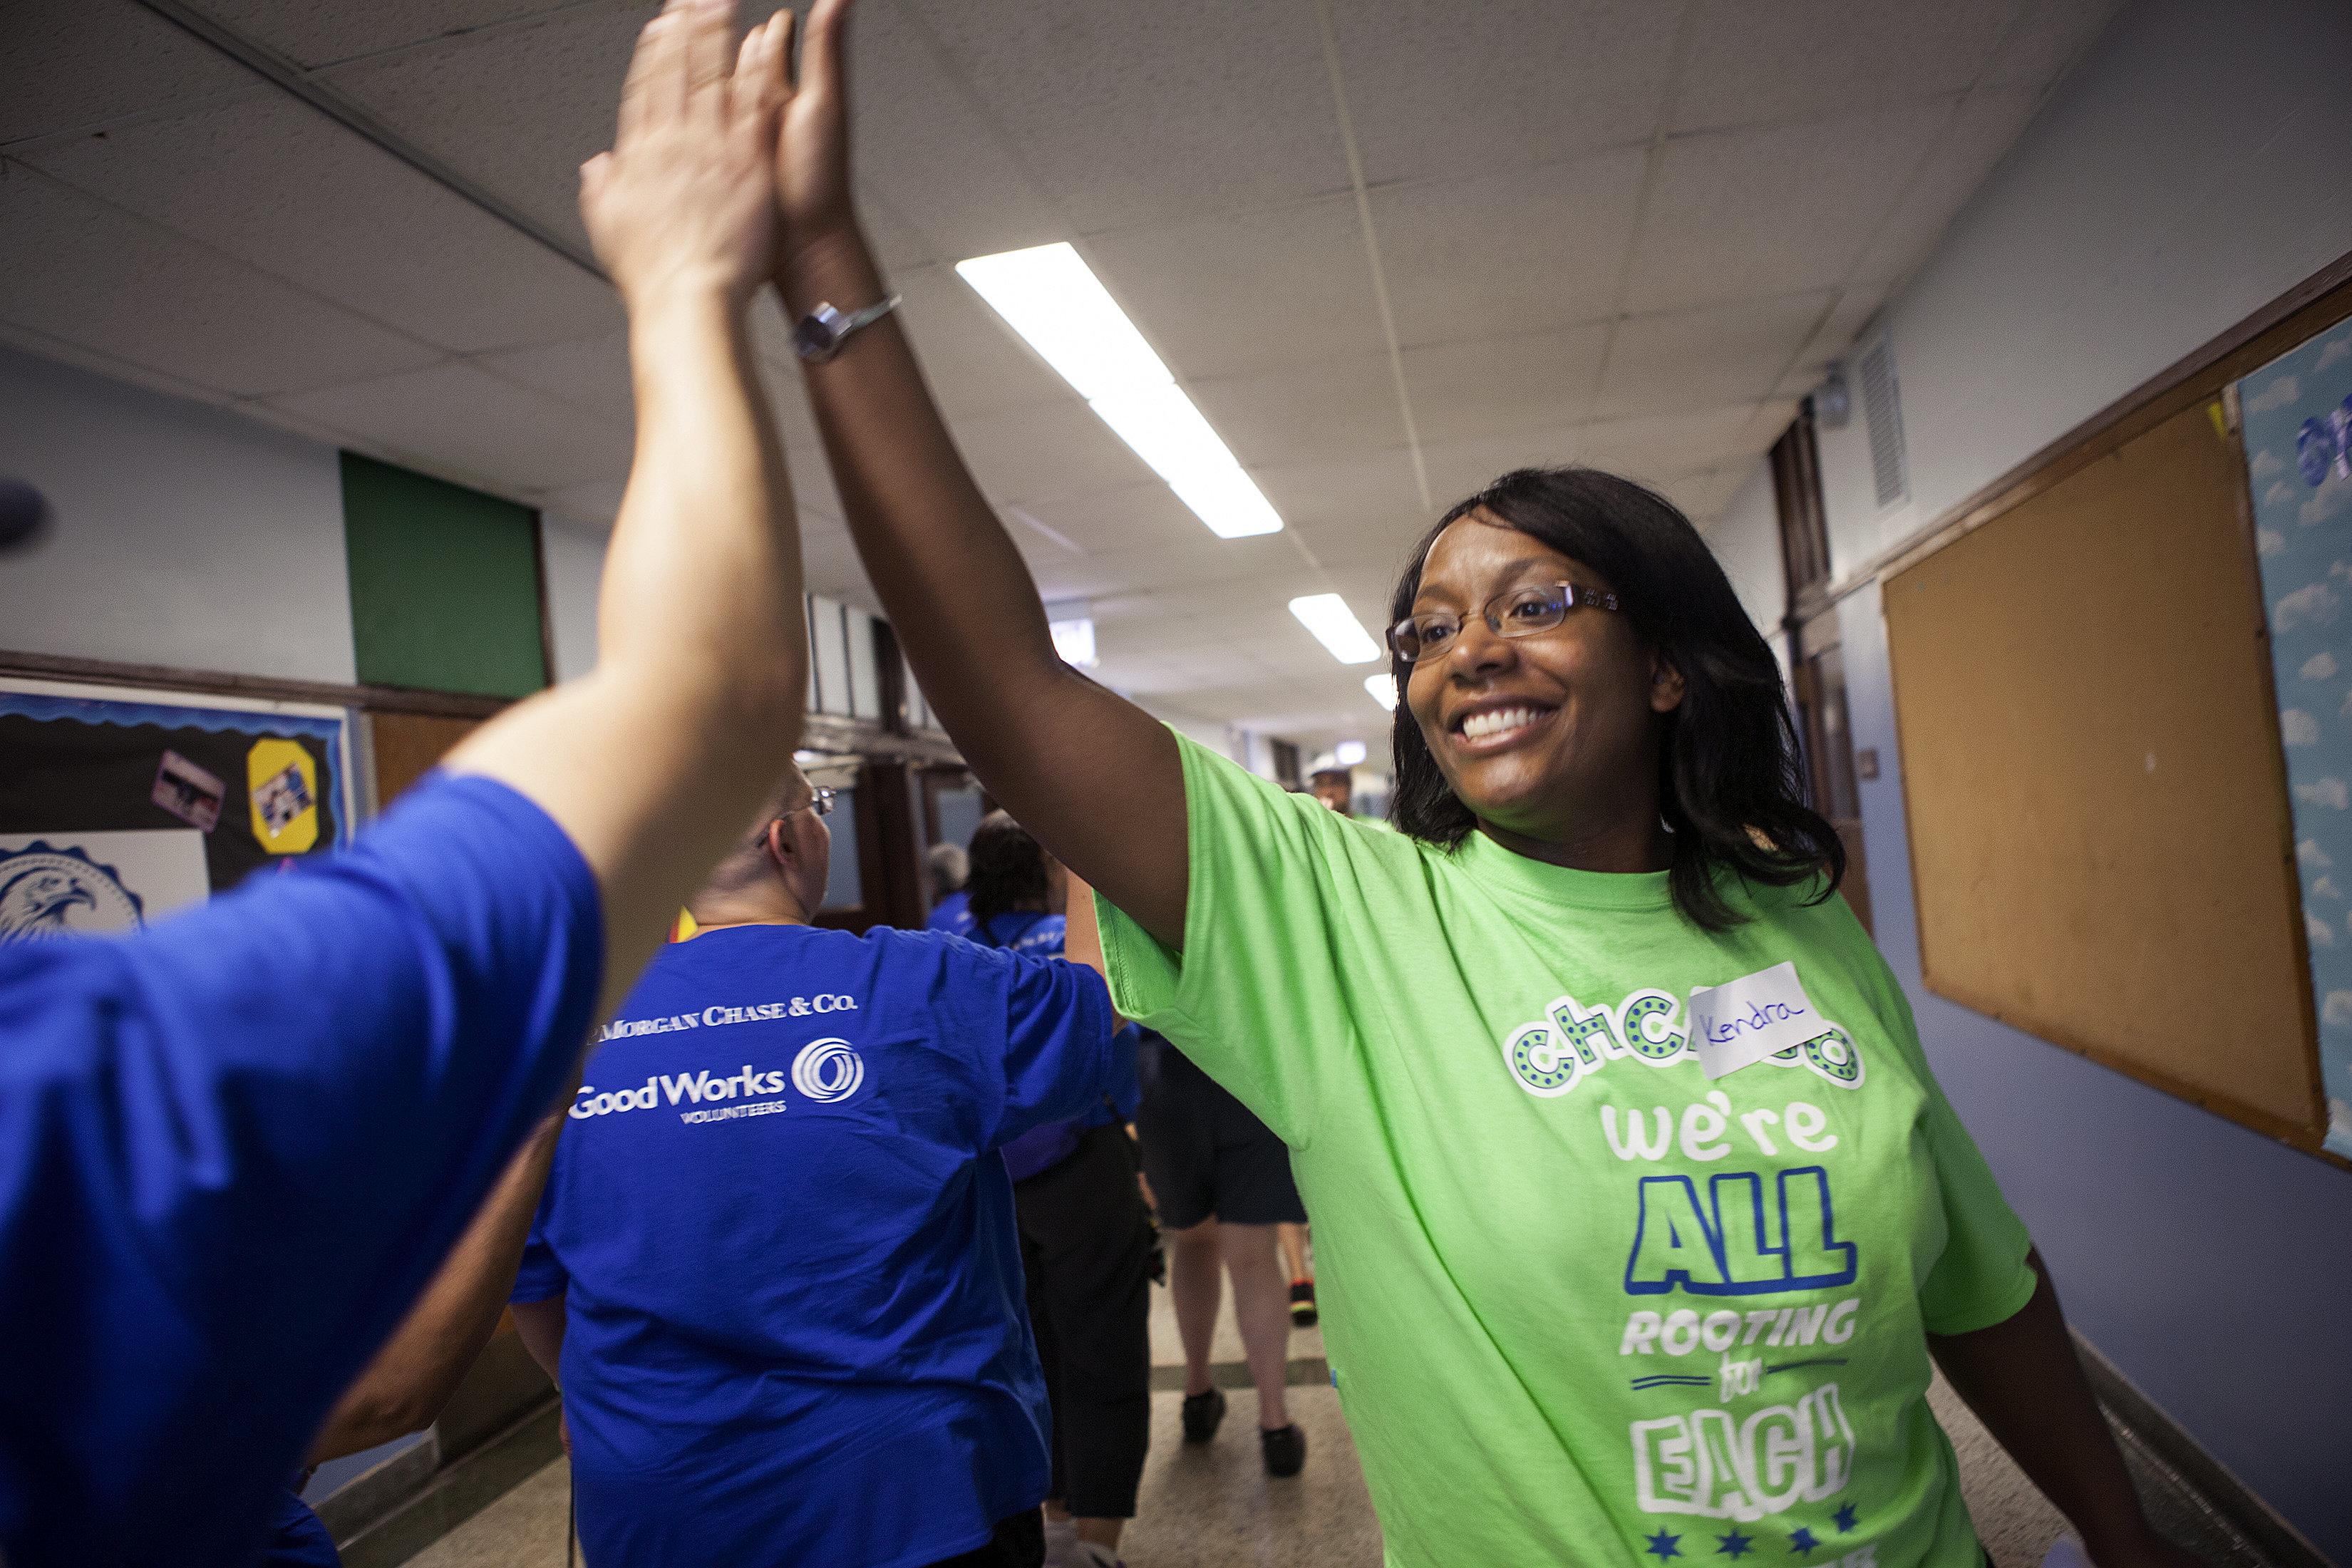 How Americans Volunteer In The Age Of